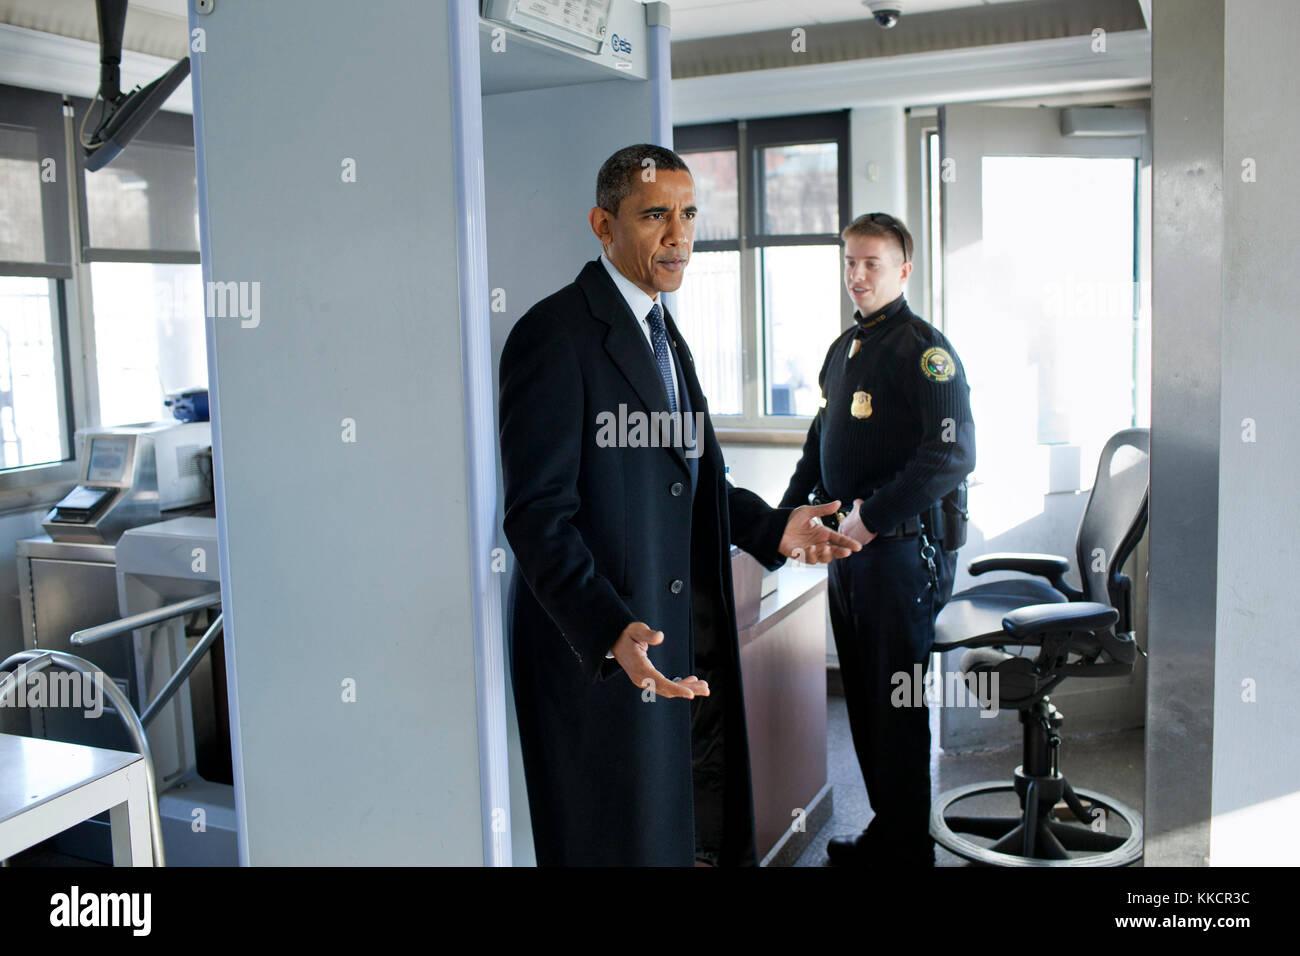 Secret Service White House Stock Photos & Secret Service White House ...